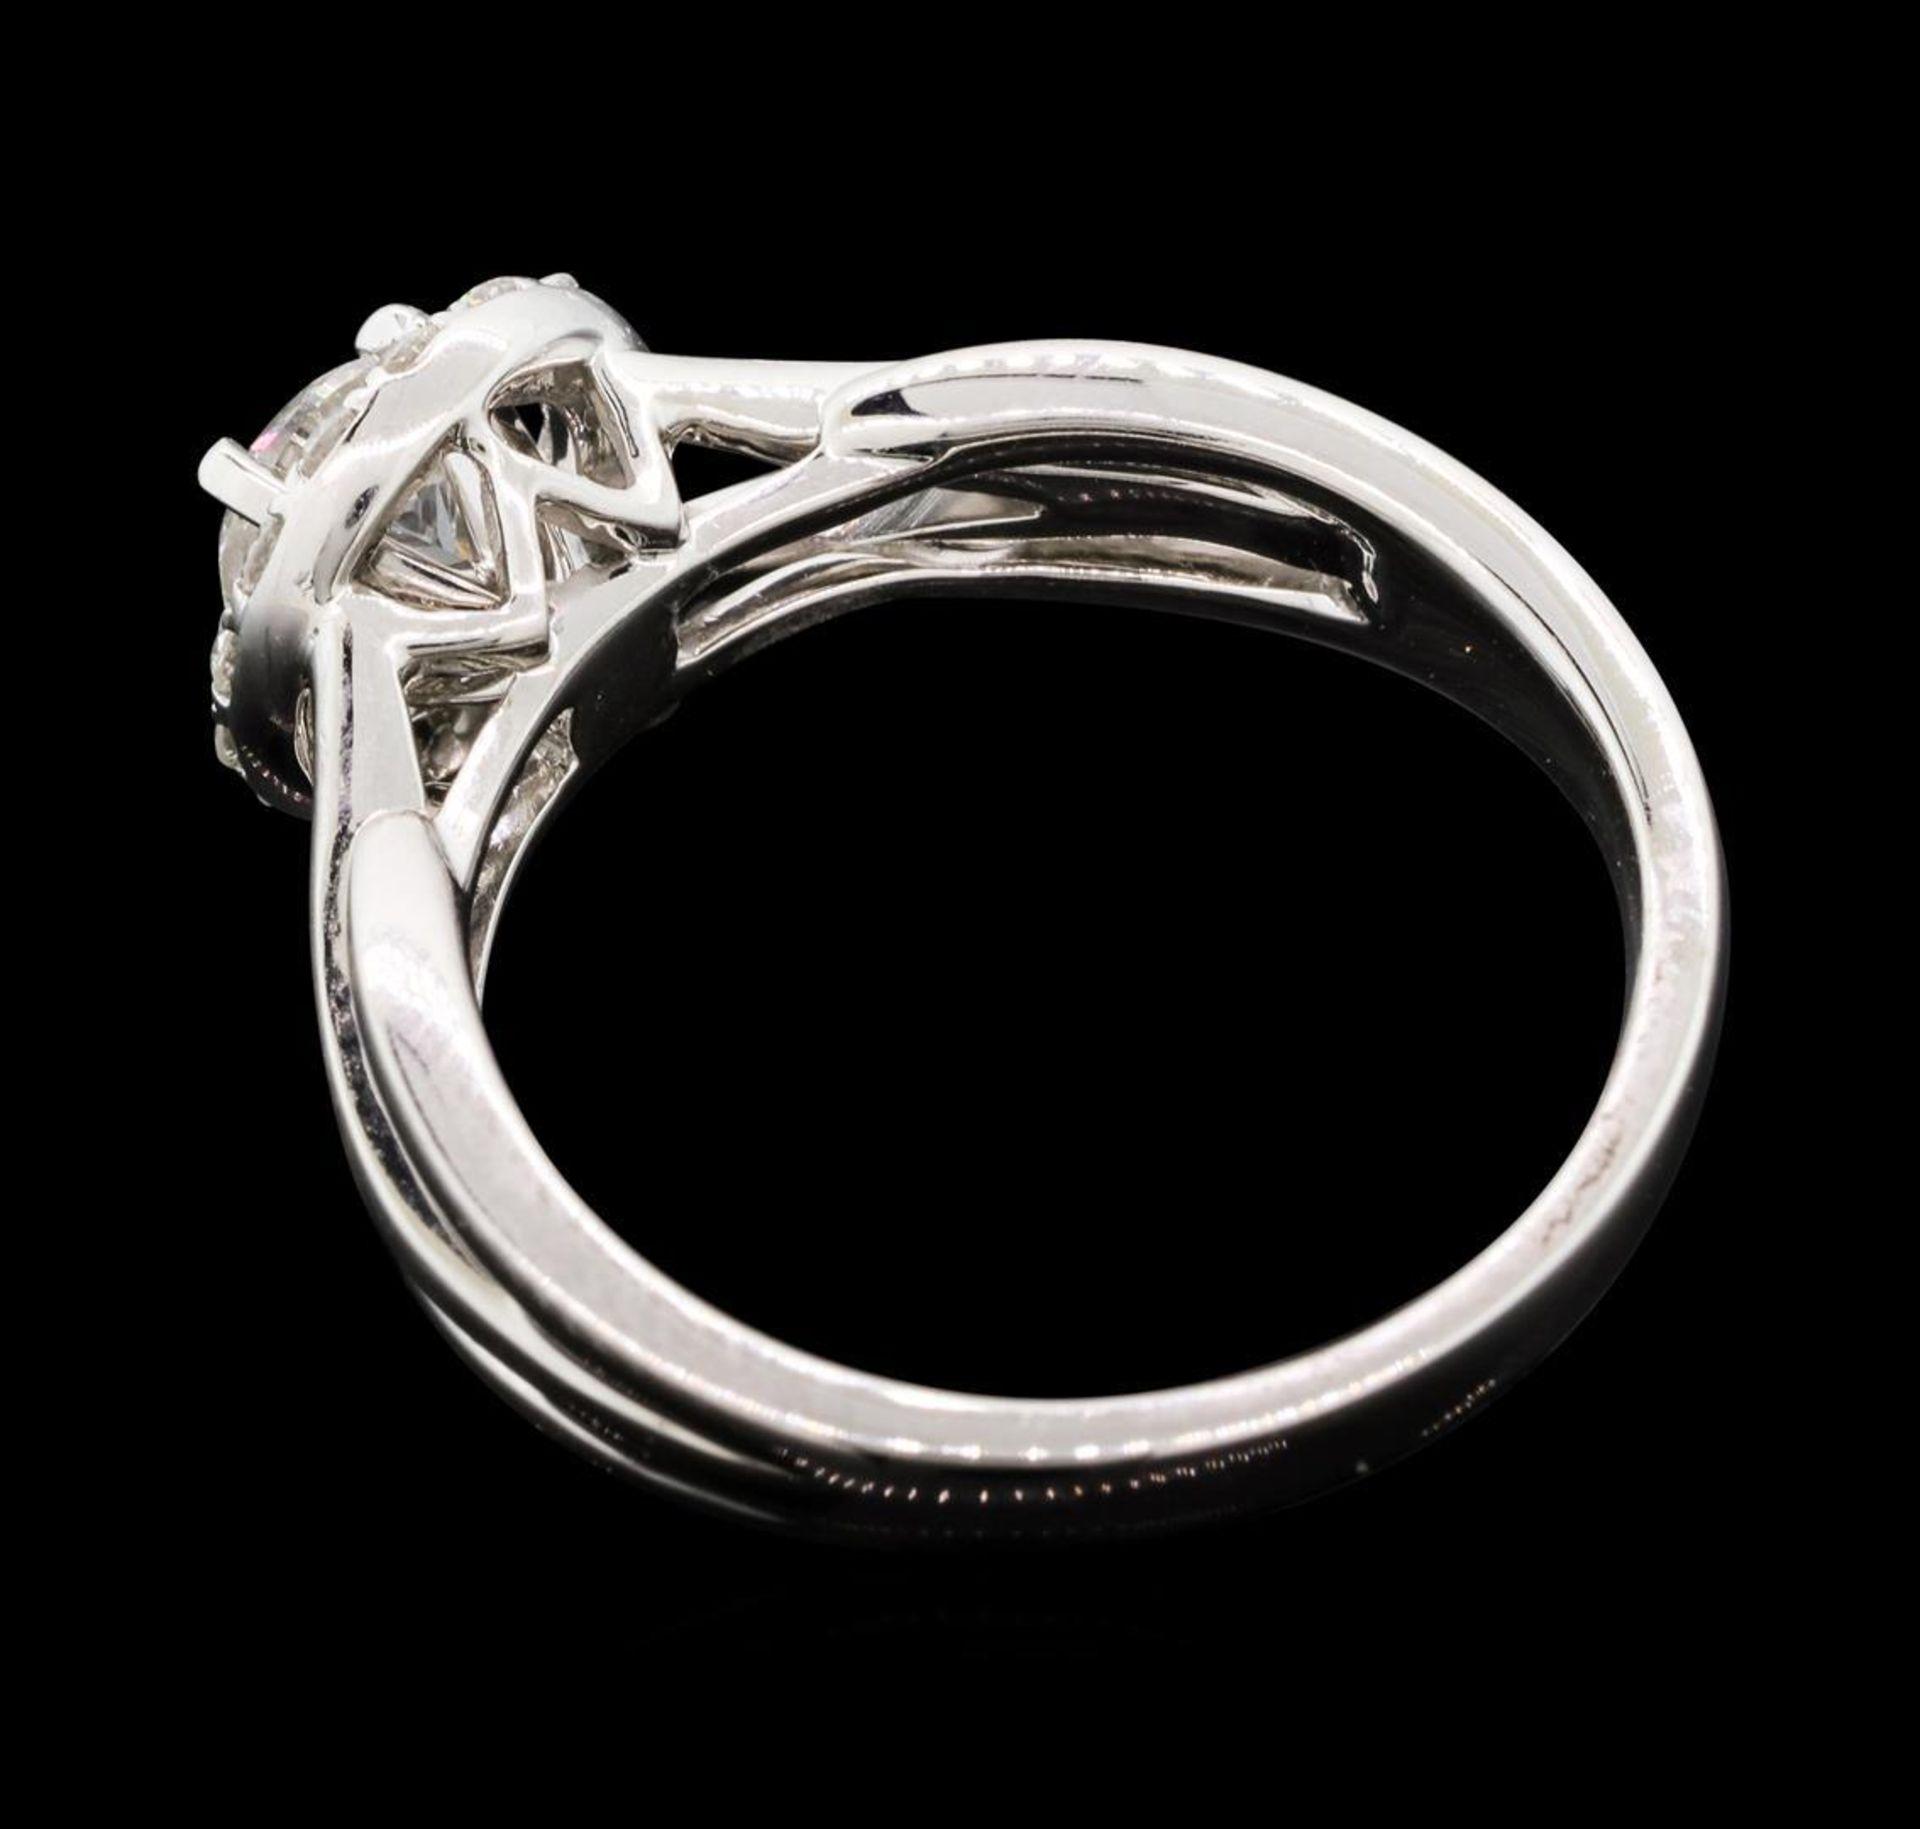 0.74 ctw Diamond Ring - 14KT White Gold - Image 3 of 5